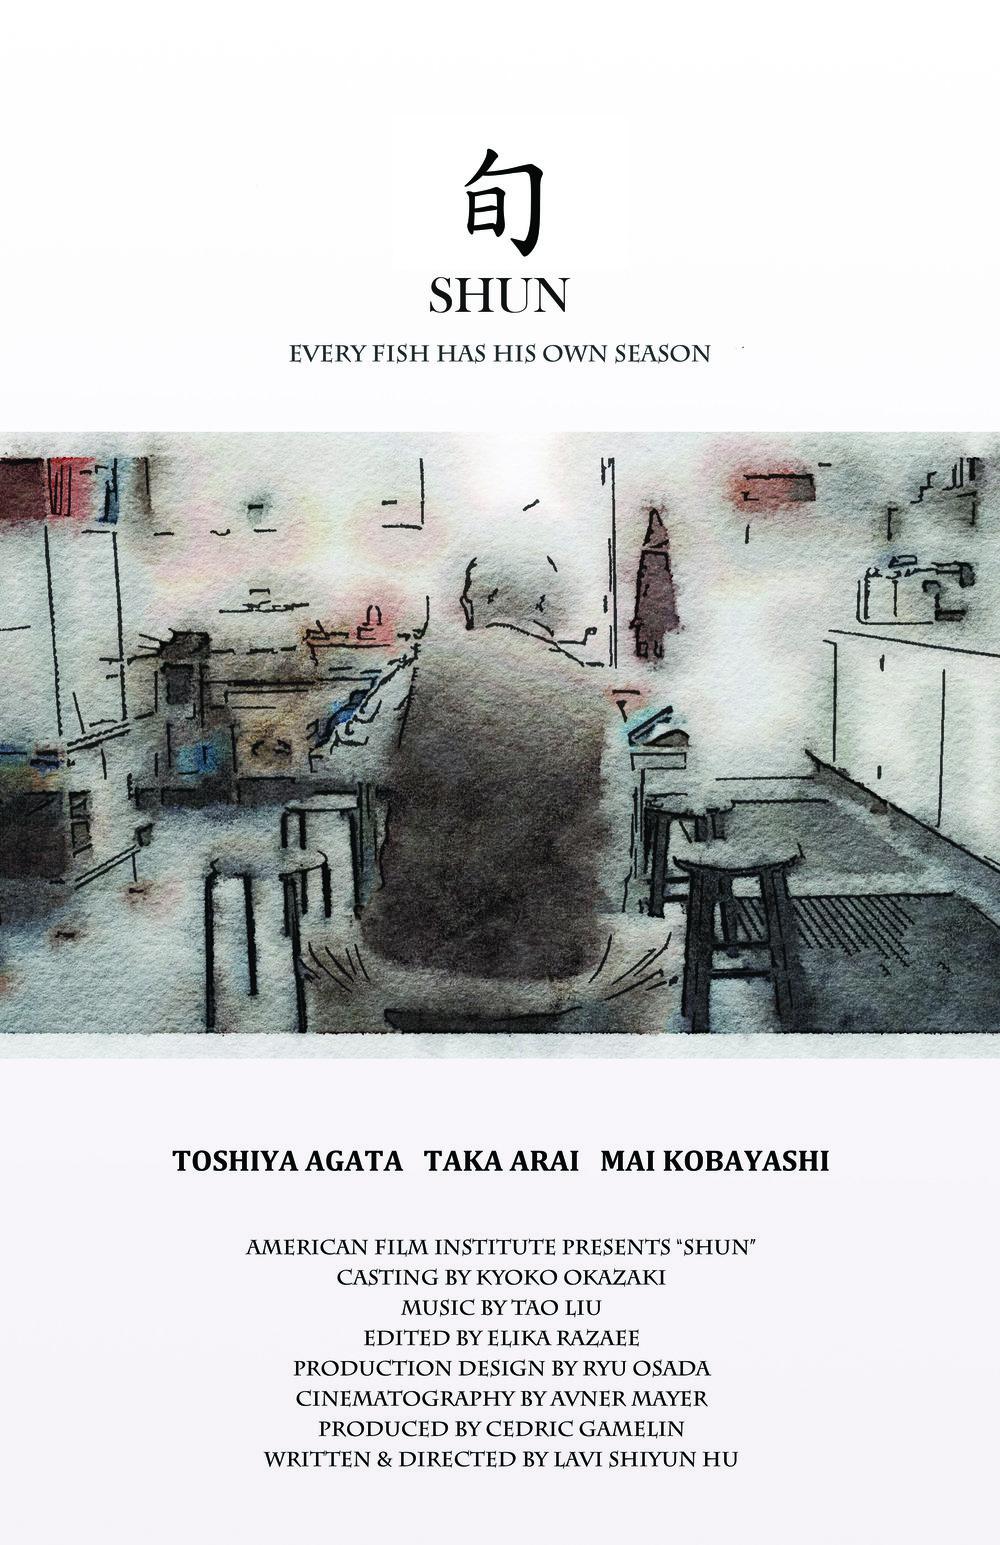 SHUN poster.jpg